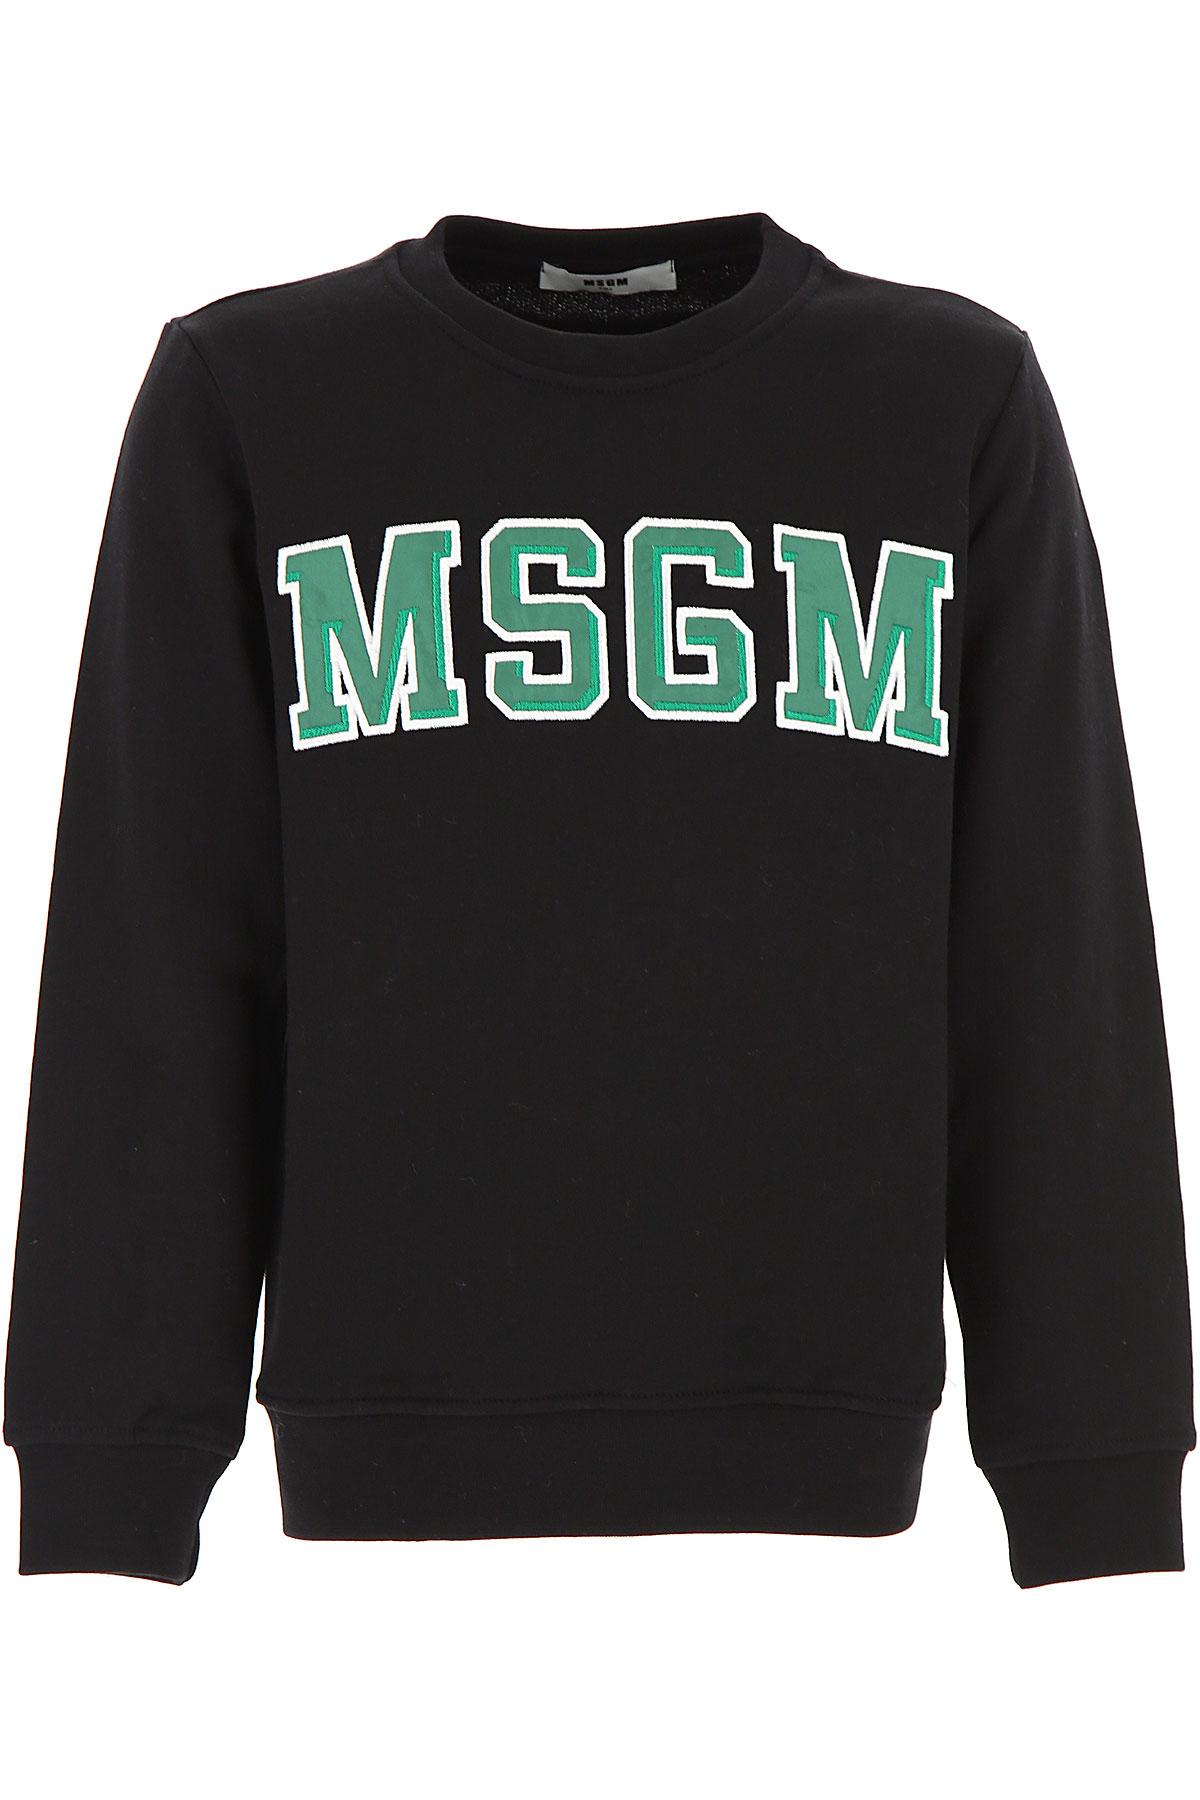 MSGM Kids Sweatshirts & Hoodies for Boys, Black, Cotton, 2017, 10Y 14Y 8Y